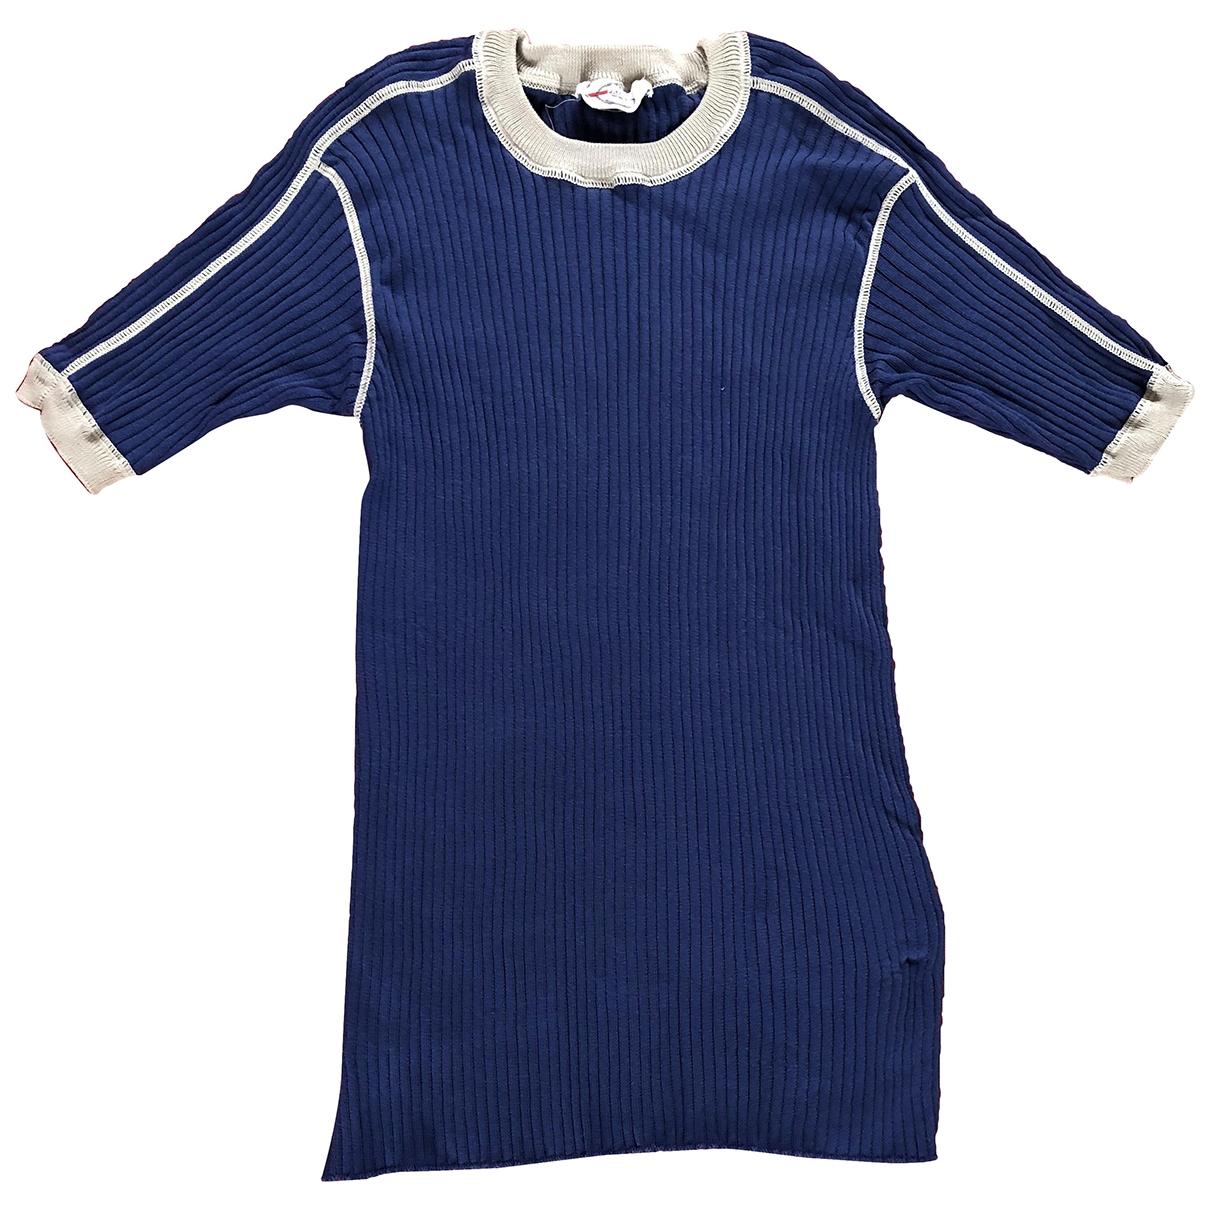 Prada \N Cotton  top for Women 50-52 IT